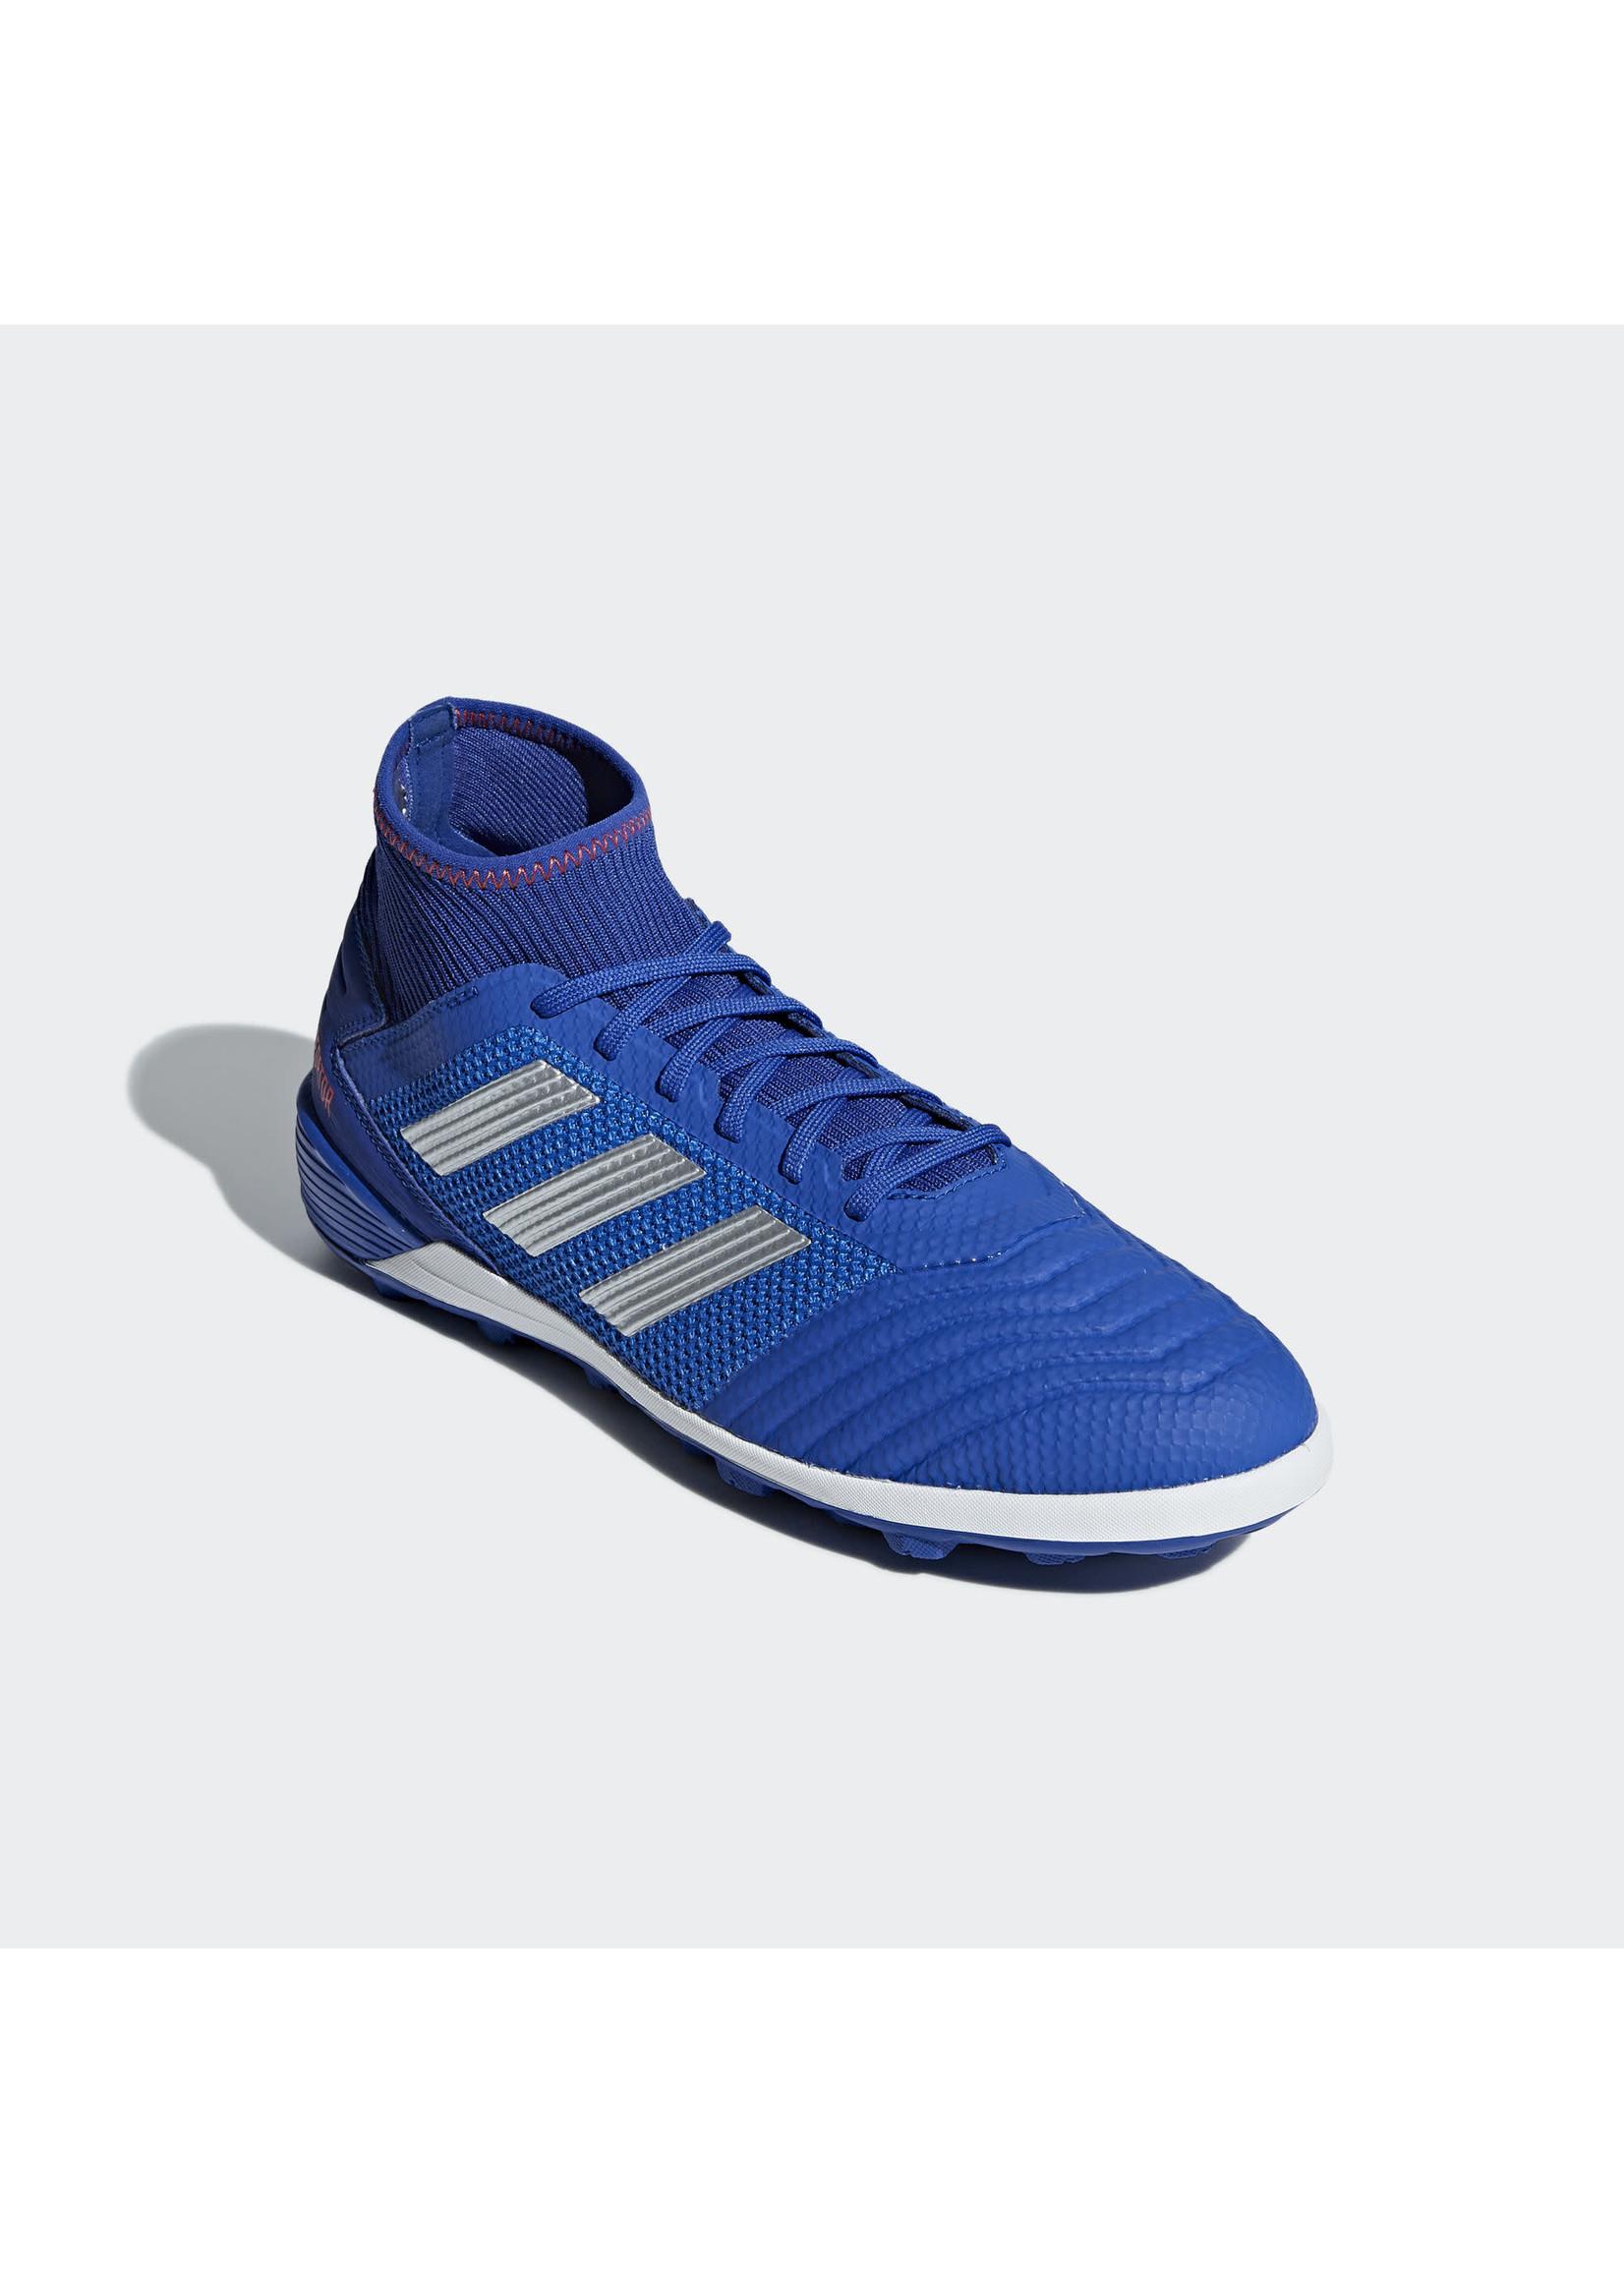 Adidas Predator 19.3 TF I